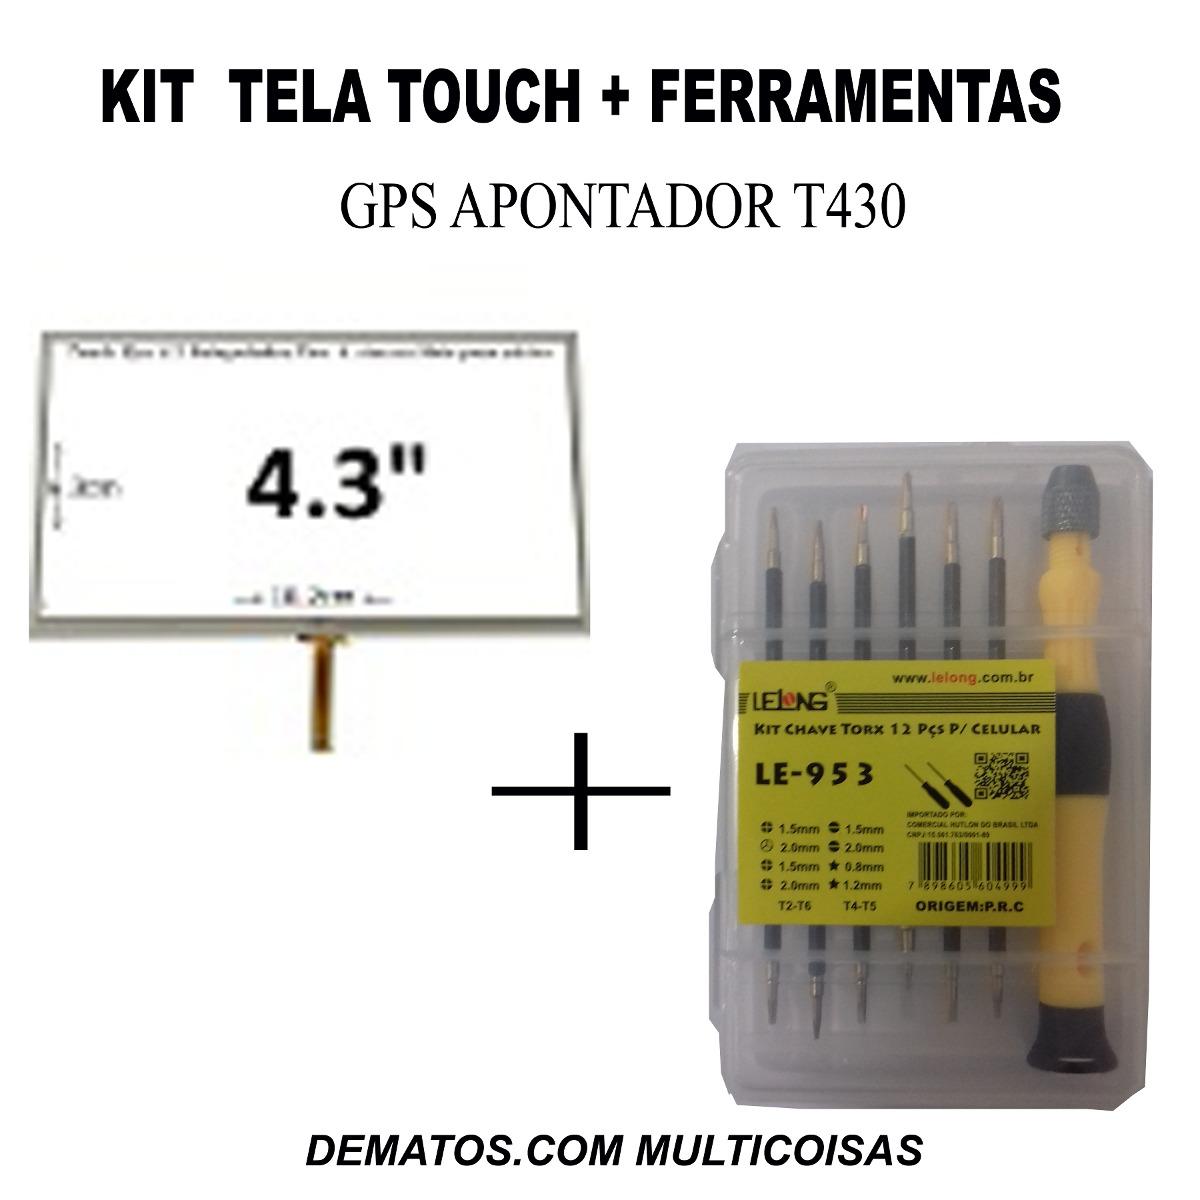 Kit Tela Touch Screen,gps Apontador T430 + Ferramentas 12 Ps